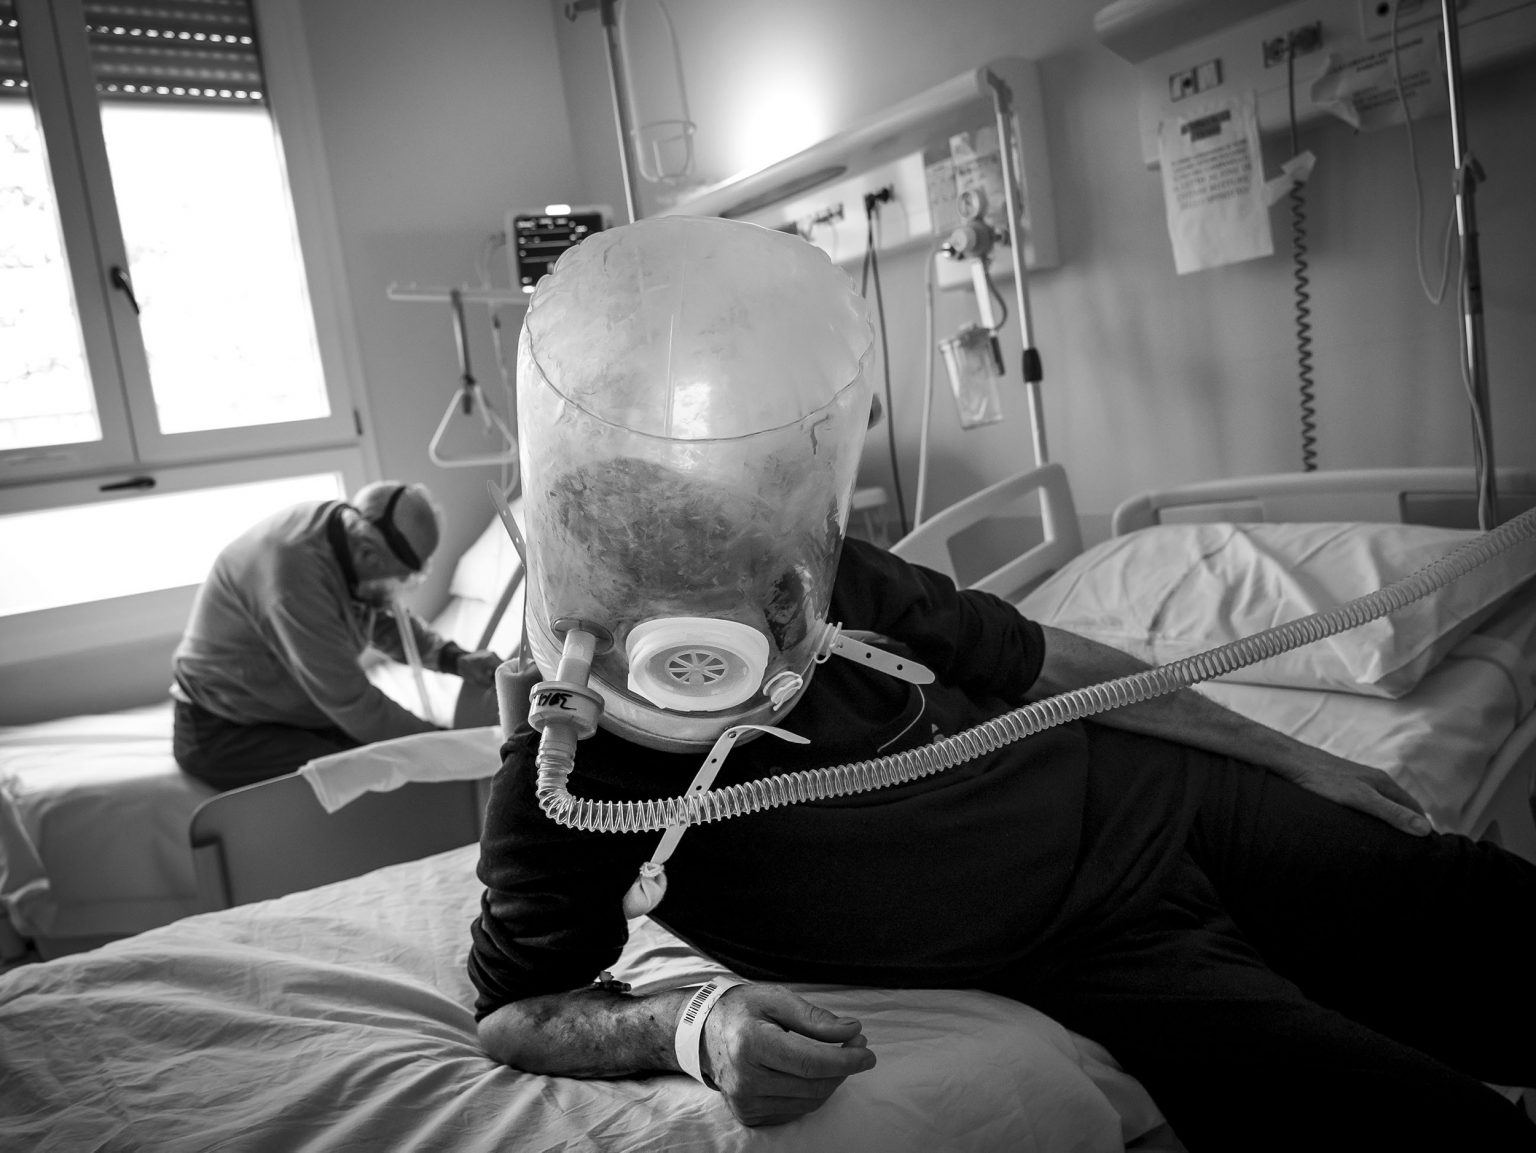 B. Ramazzini Civil Hospital. Department of Covid-19 Emergency Medicine. Carpi, Modena, Italy, 2020